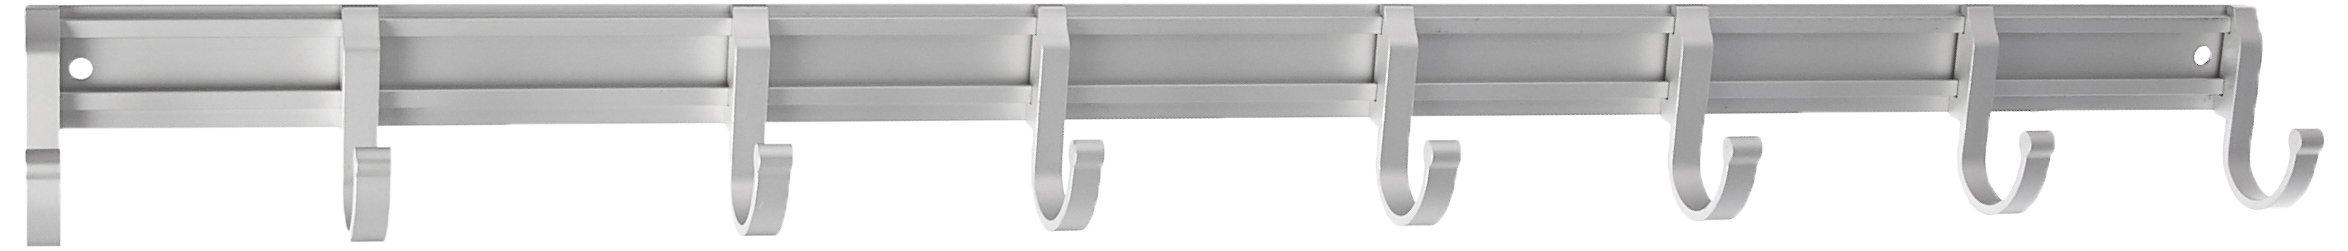 AIQIZI AR-QL322 Patent Non-Drill Wall Mount Coat Hat Towel Hook Rack, 8 Hooks Suction Type Creative Space Aluminum